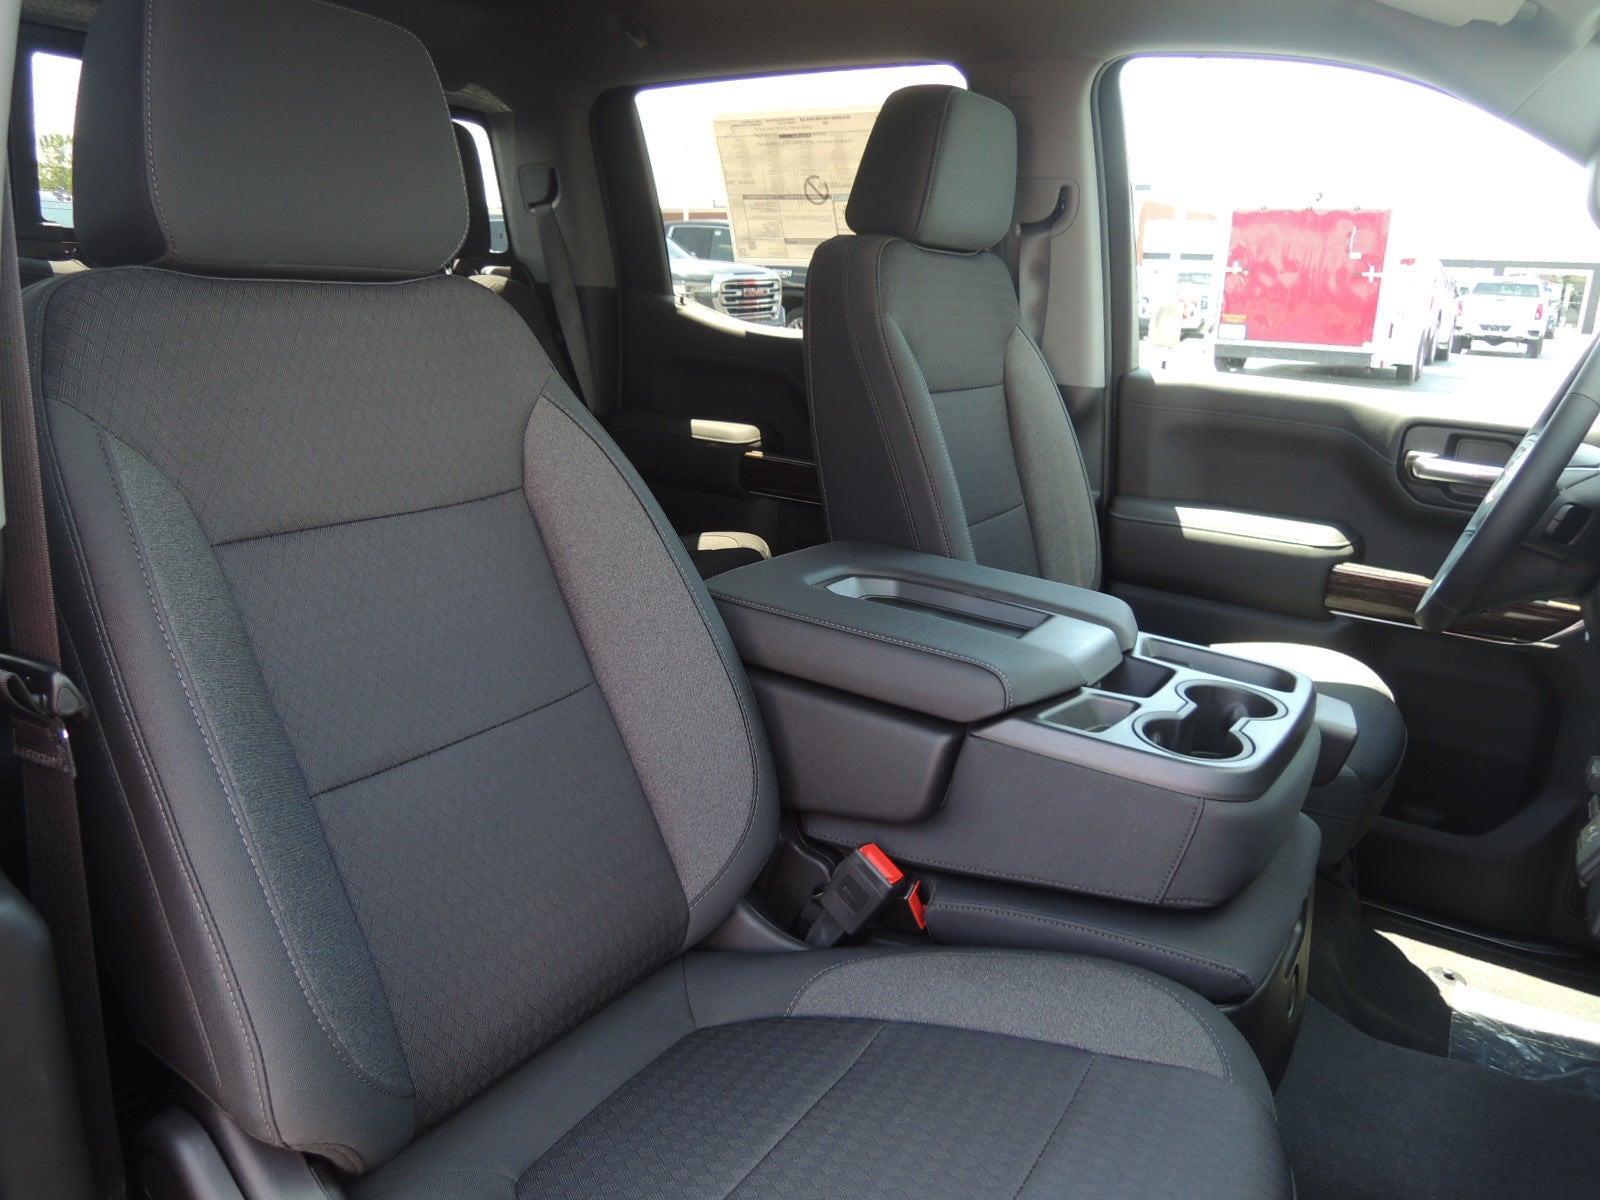 2021 GMC Sierra 1500 Crew Cab 4x4, Pickup #MT735 - photo 13